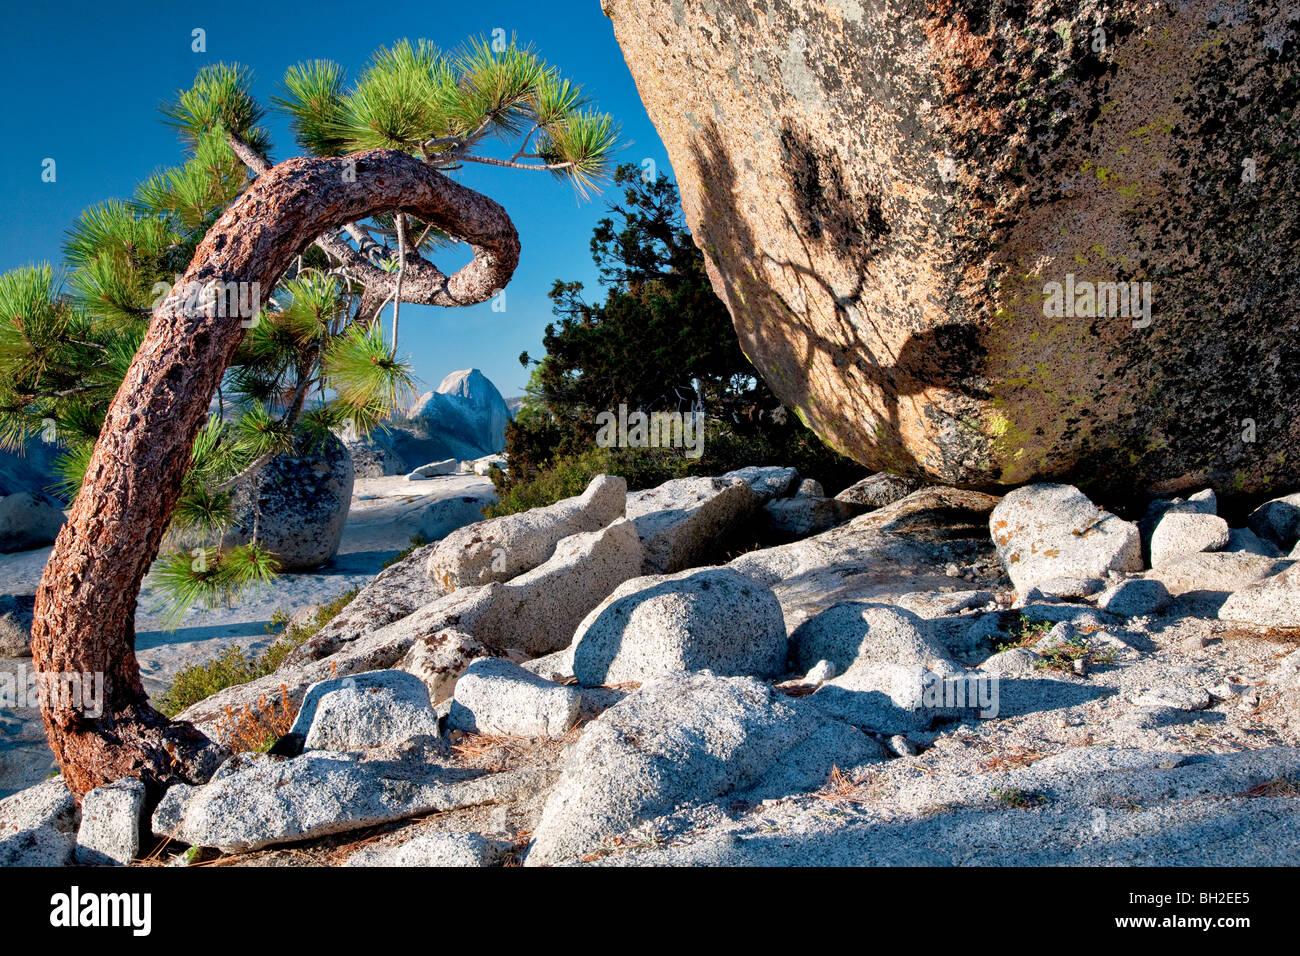 Half Dome seen through twisted tree. Yosemite National Park, California Stock Photo